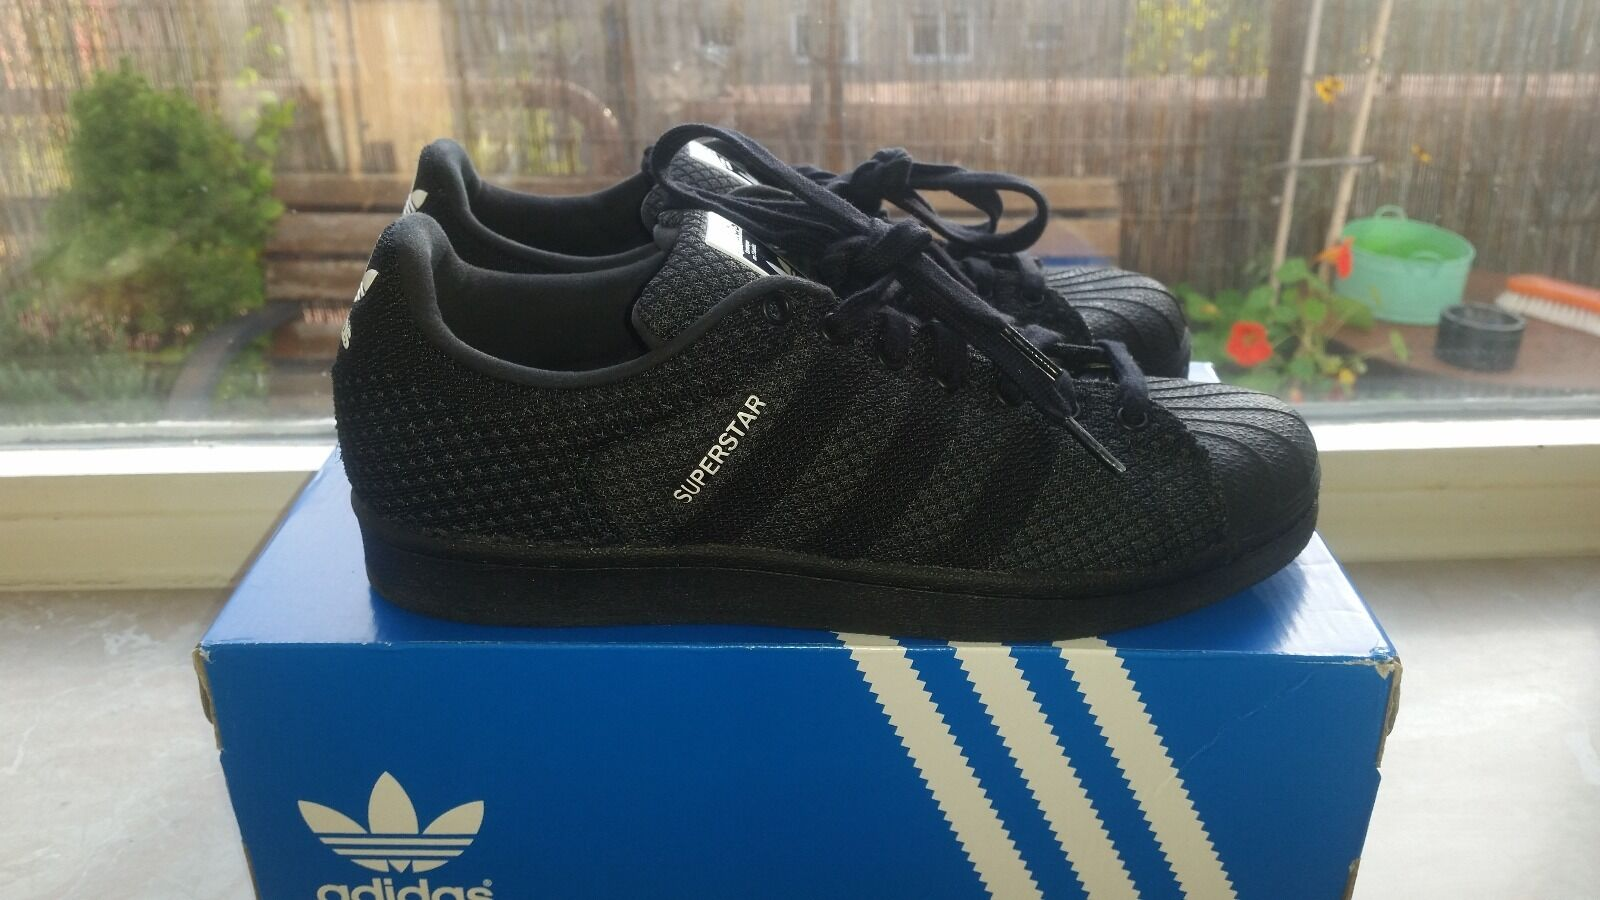 Adidas Superstar Turnschuhe (Vegan)   Gr. 40